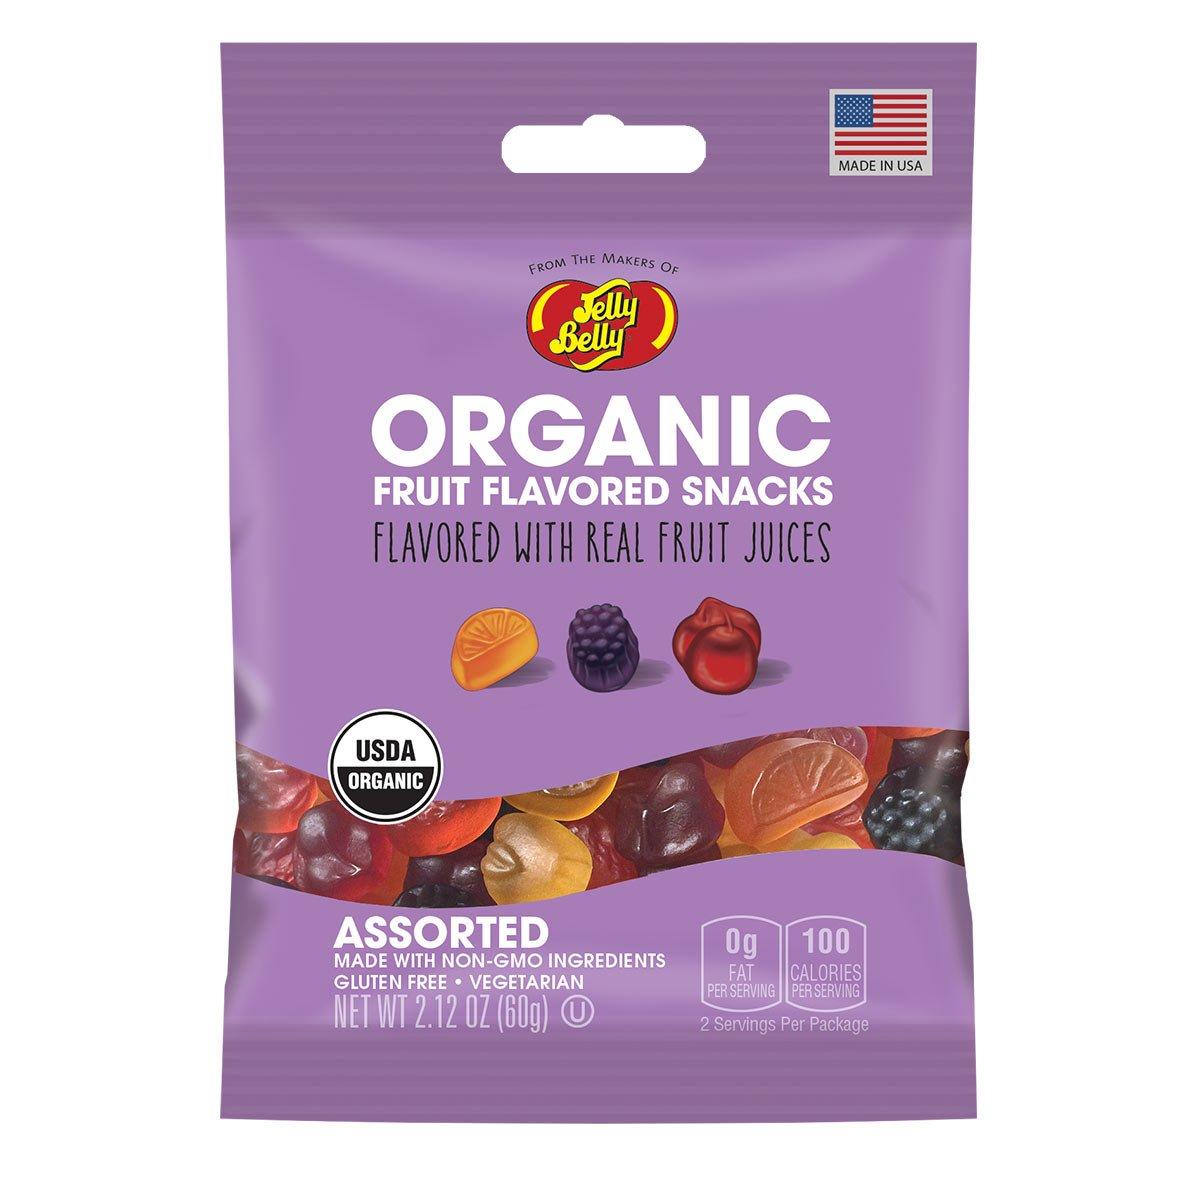 Jelly Belly Organic Fruit Snacks, 2.12-oz, 12 Pack